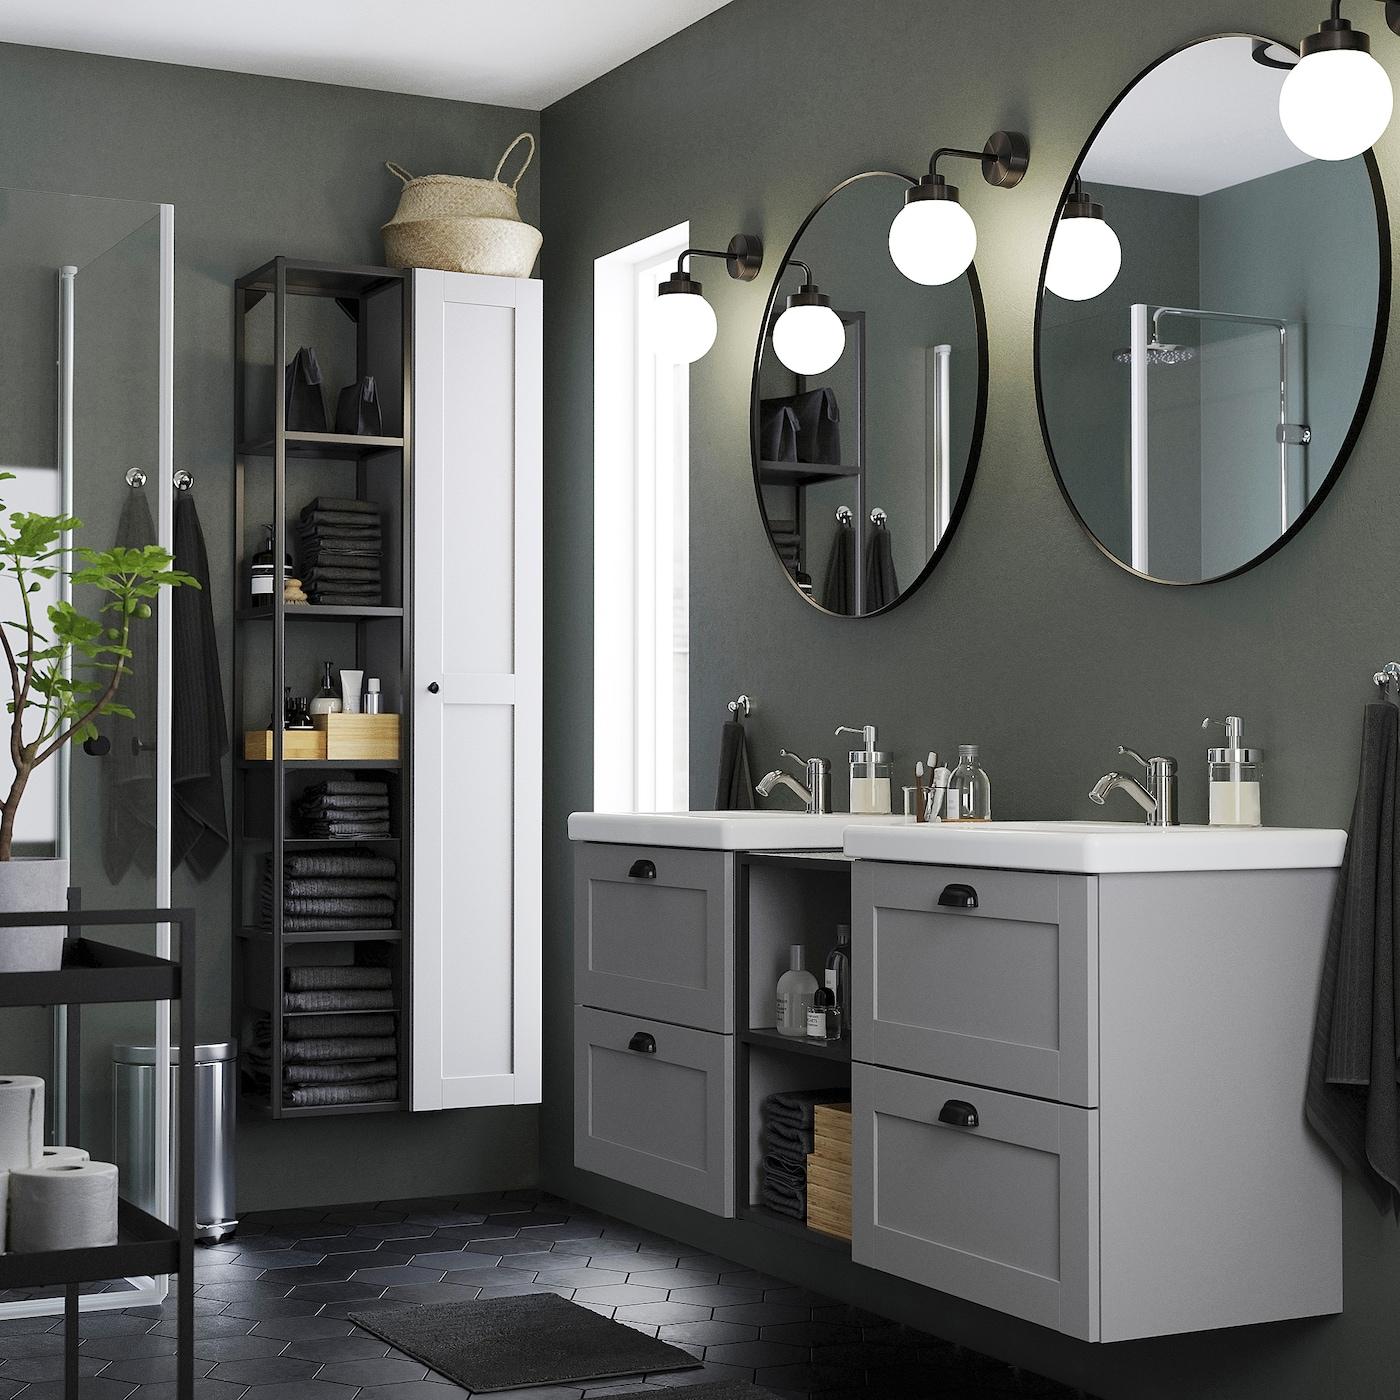 Picture of: Lindbyn Spejl Sort 80 Cm Ikea